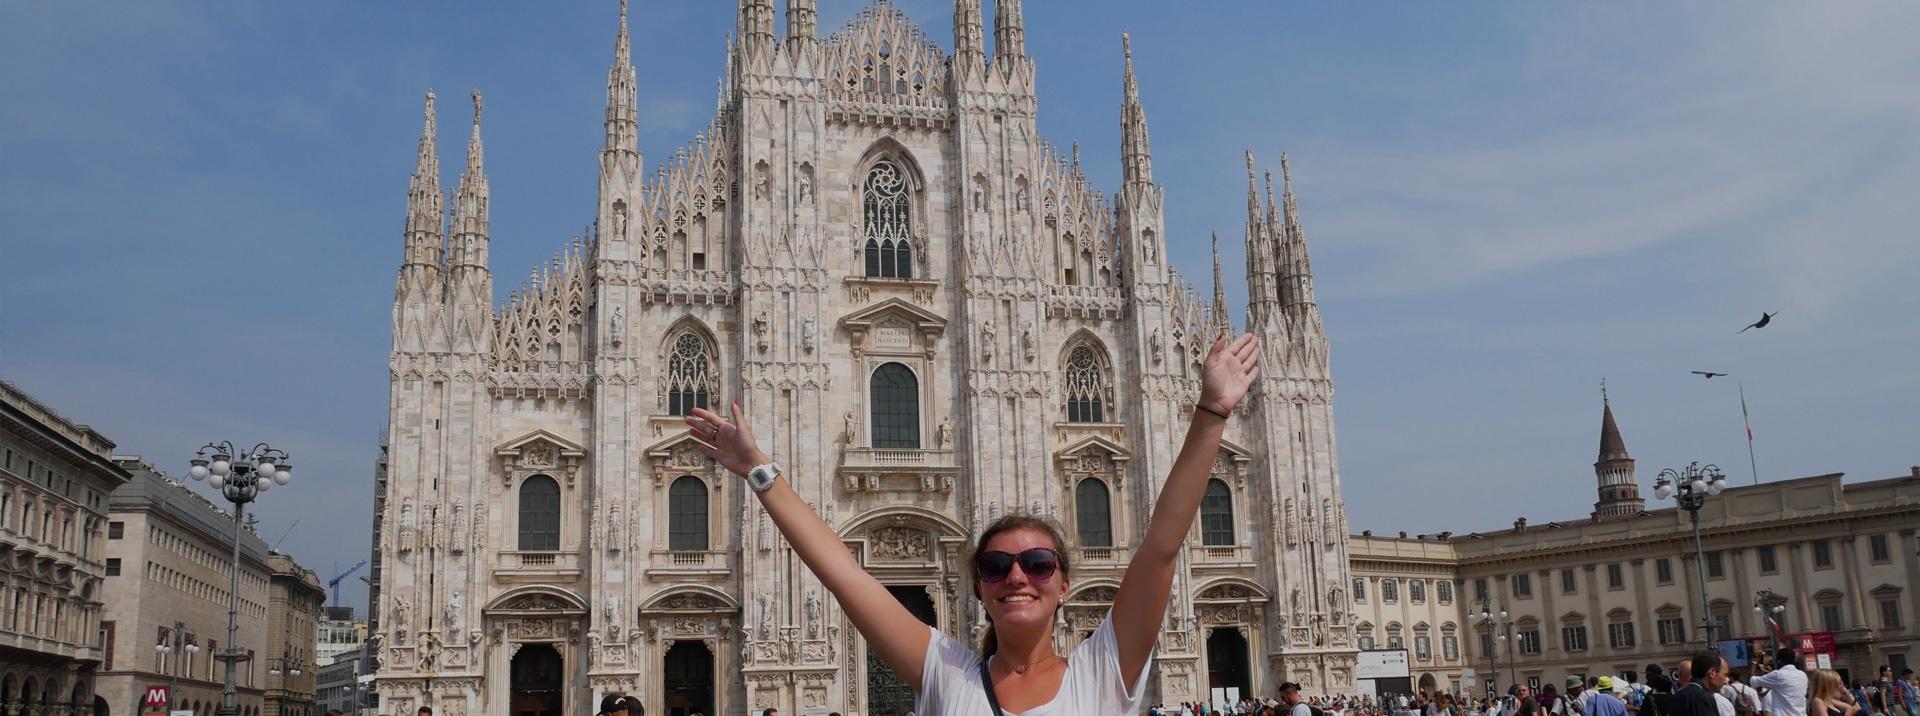 fashion business intern in Milan